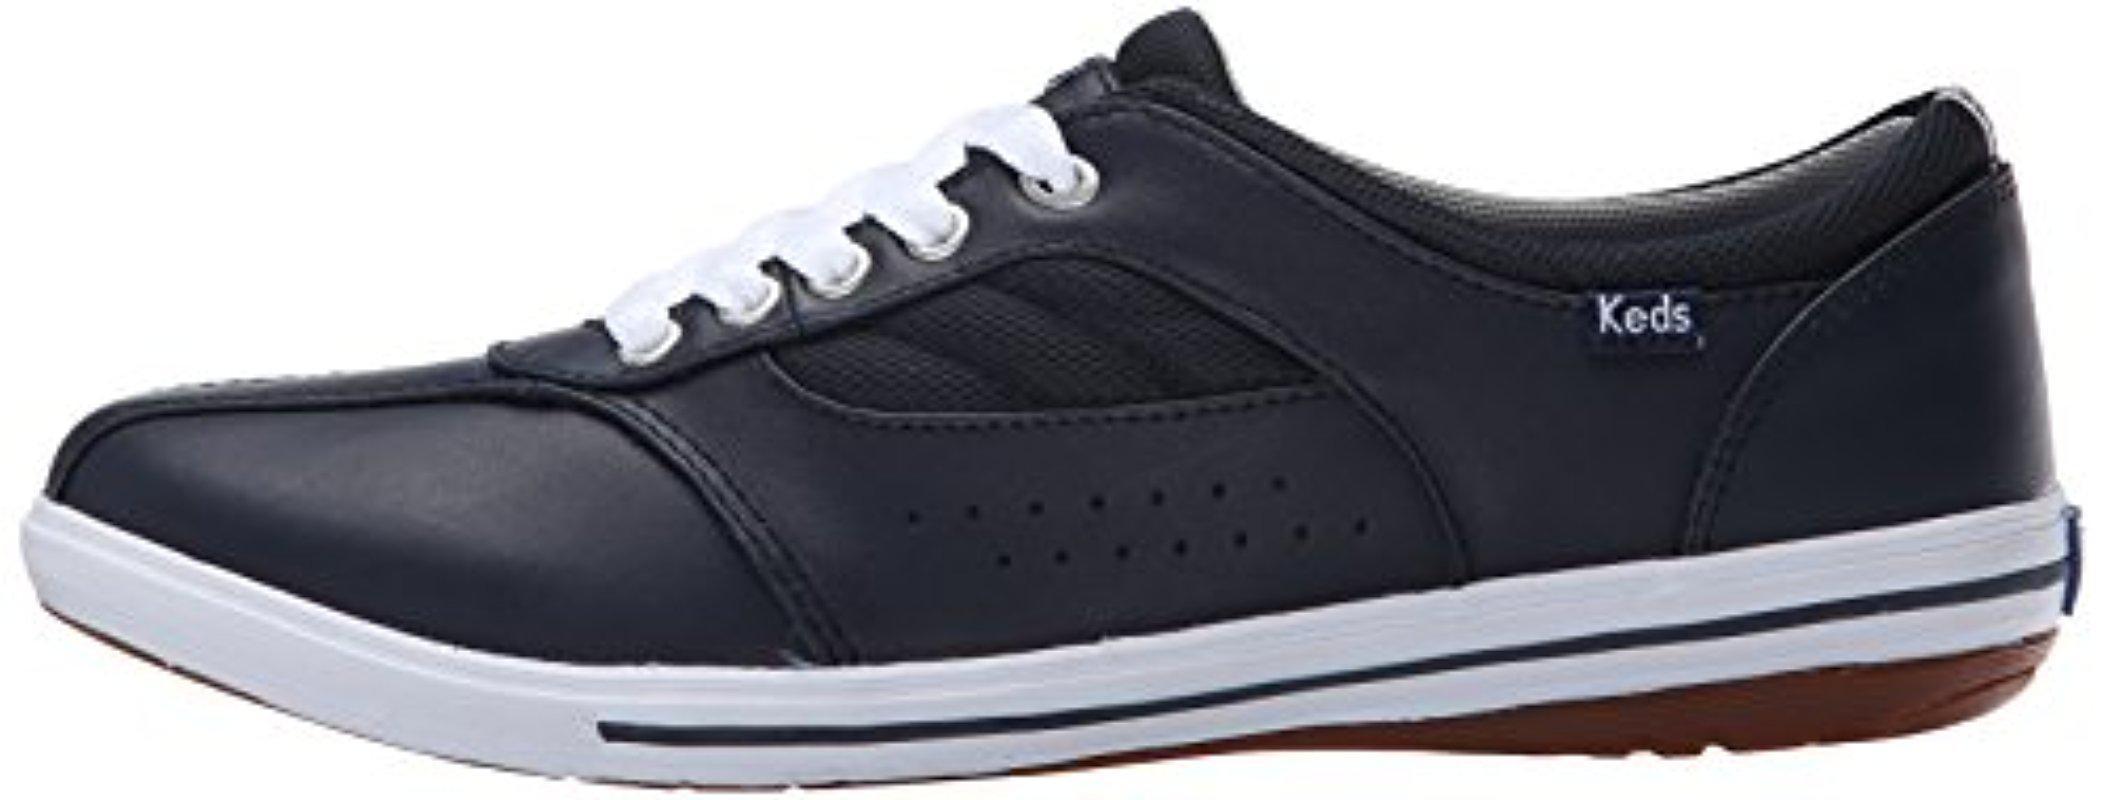 Keds Leather Prestige Fashion Sneaker